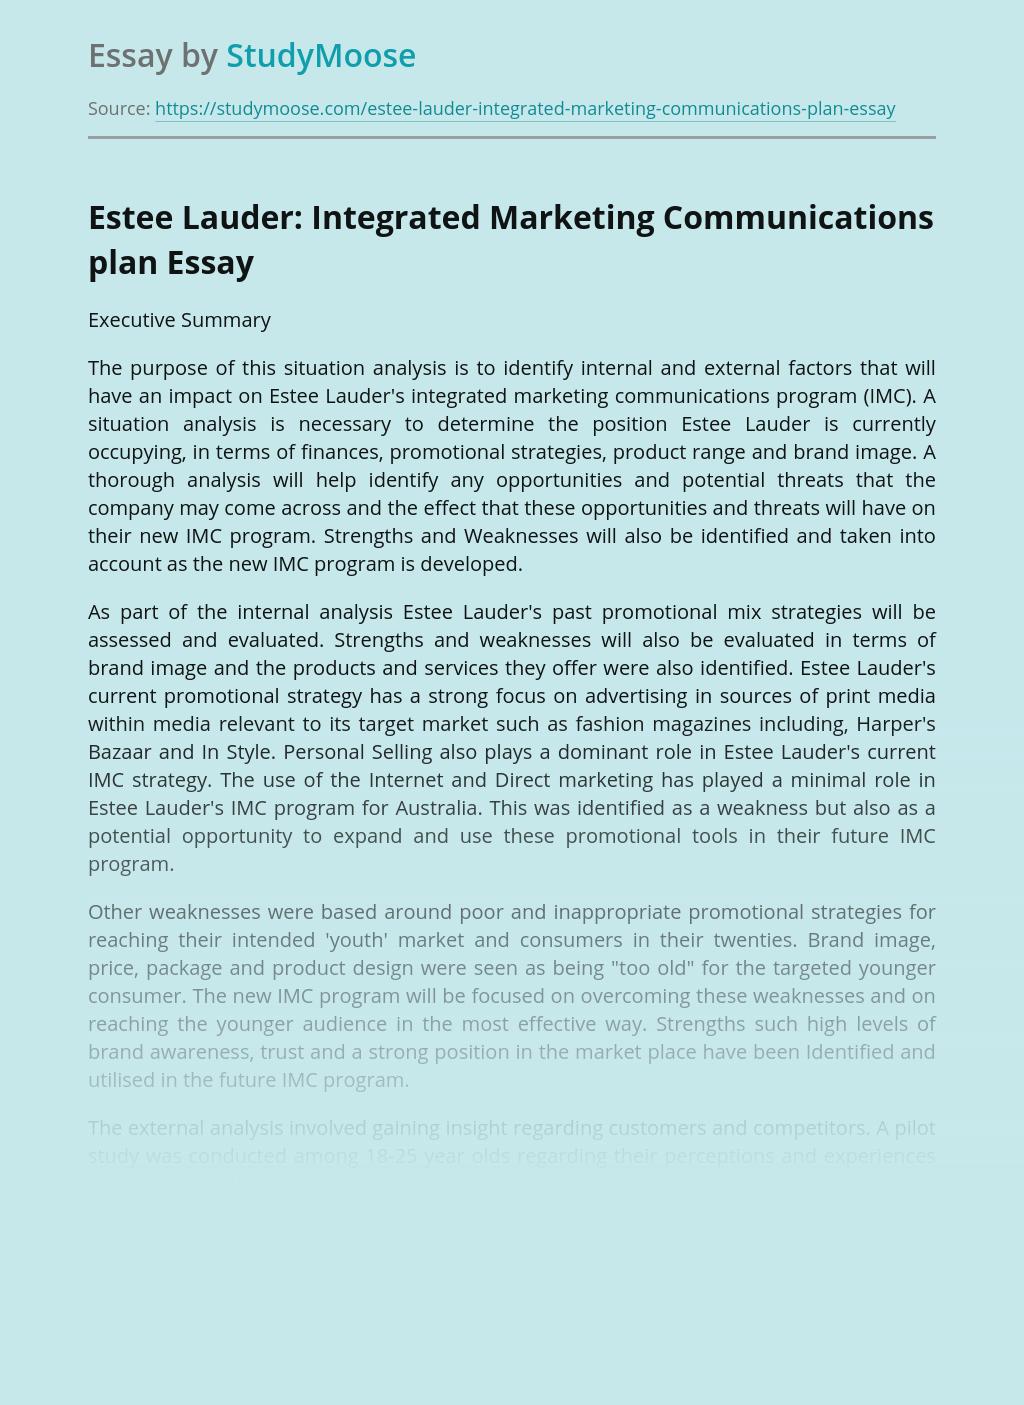 Estee Lauder: Integrated Marketing Communications plan